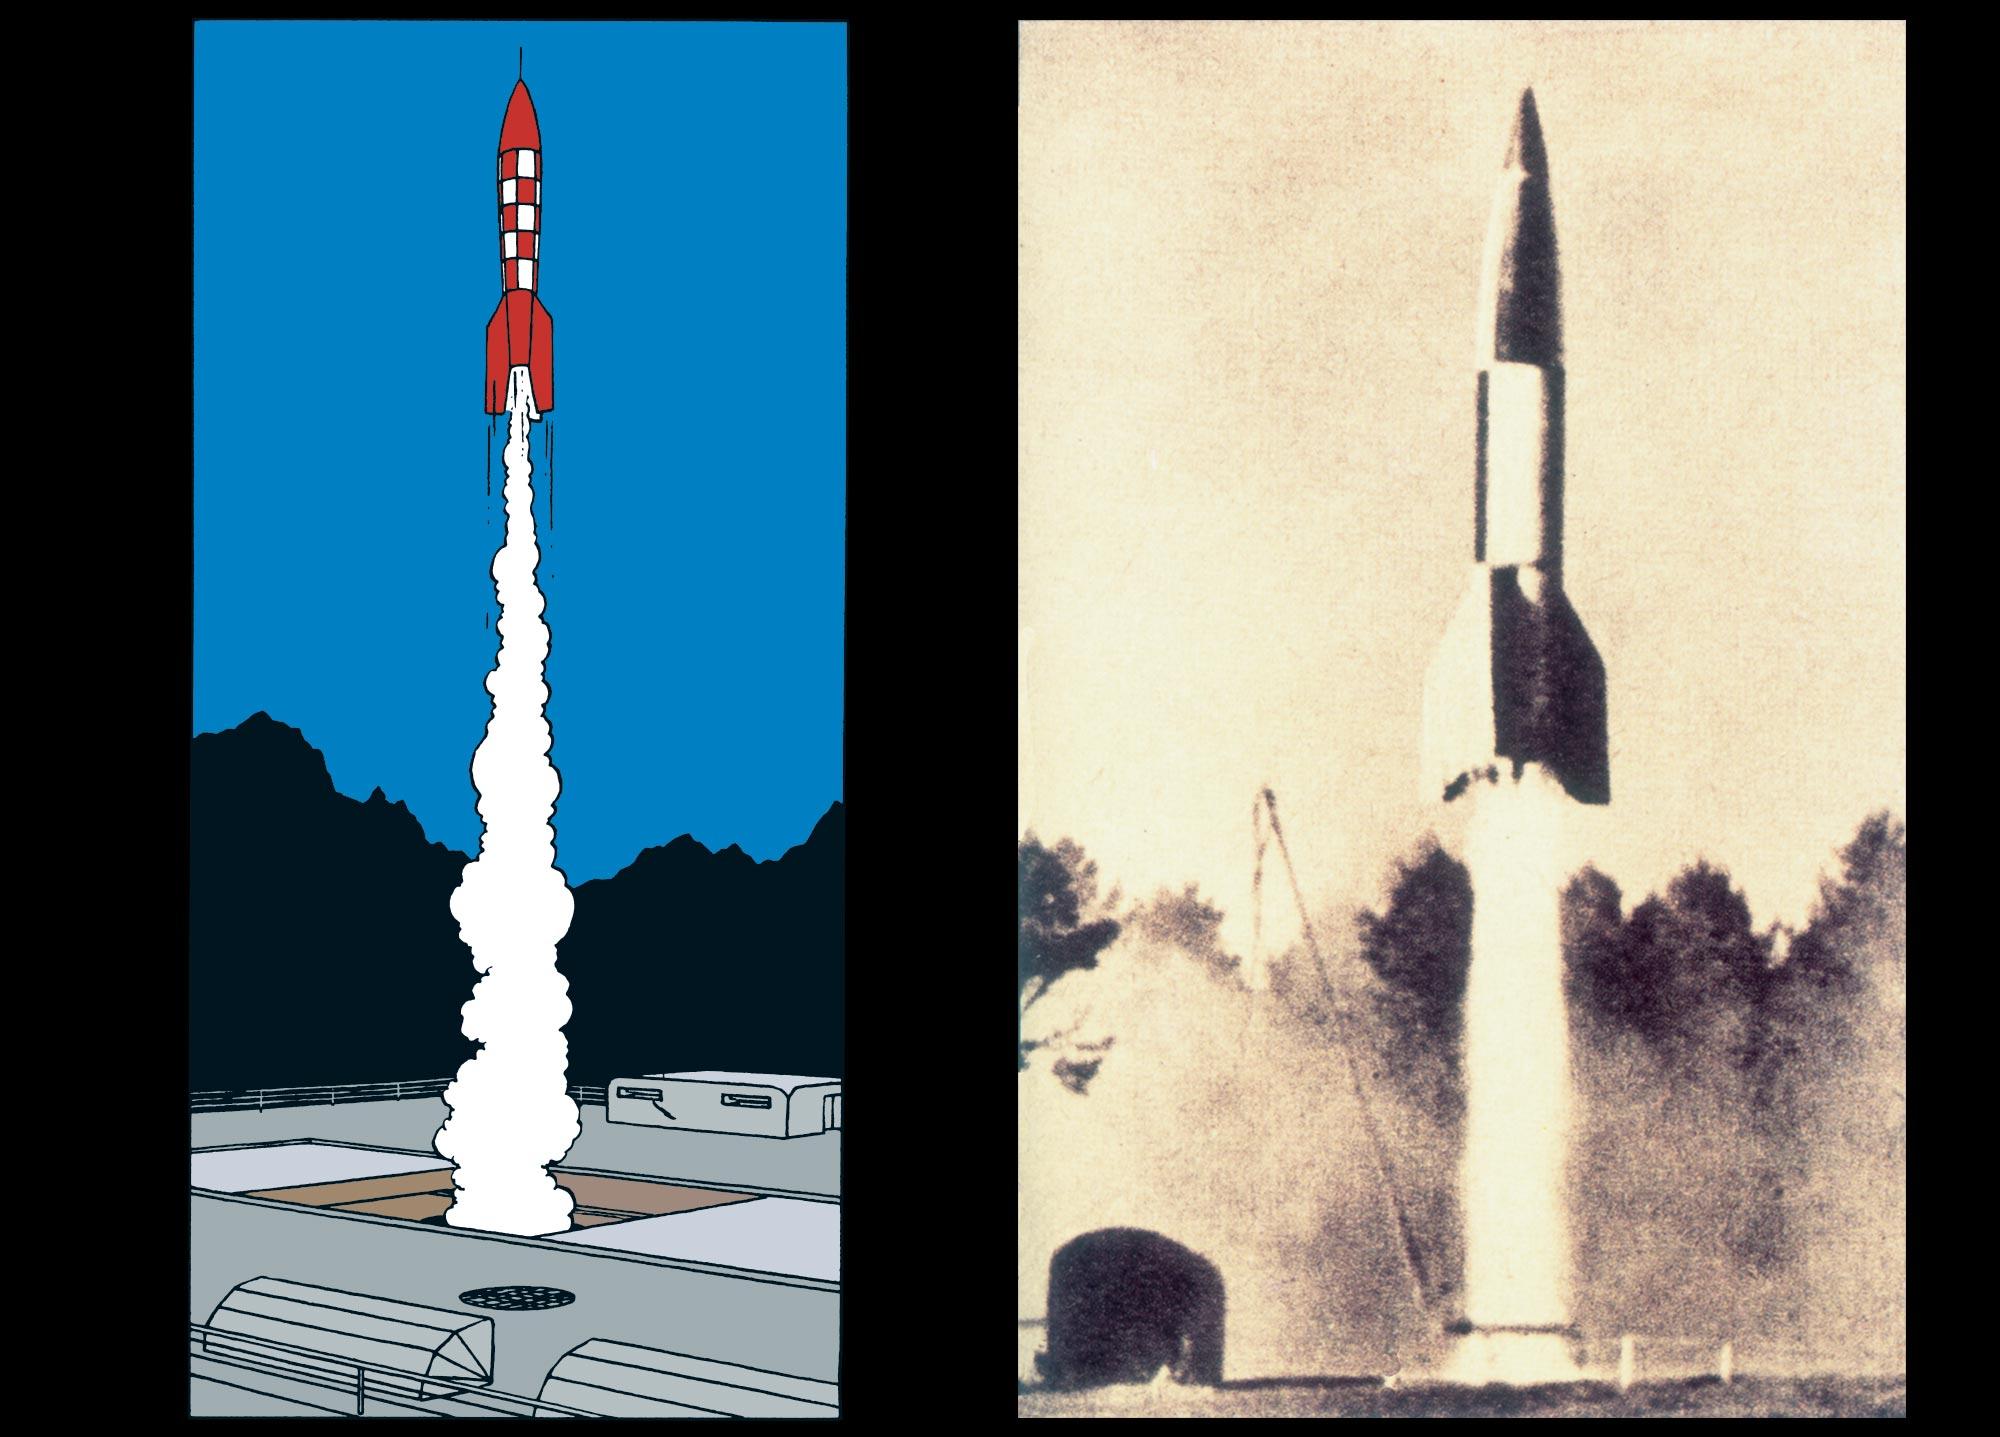 Tintin - Les Aventures de Tintin - Objectif Lune - La fusée - X-FLR6